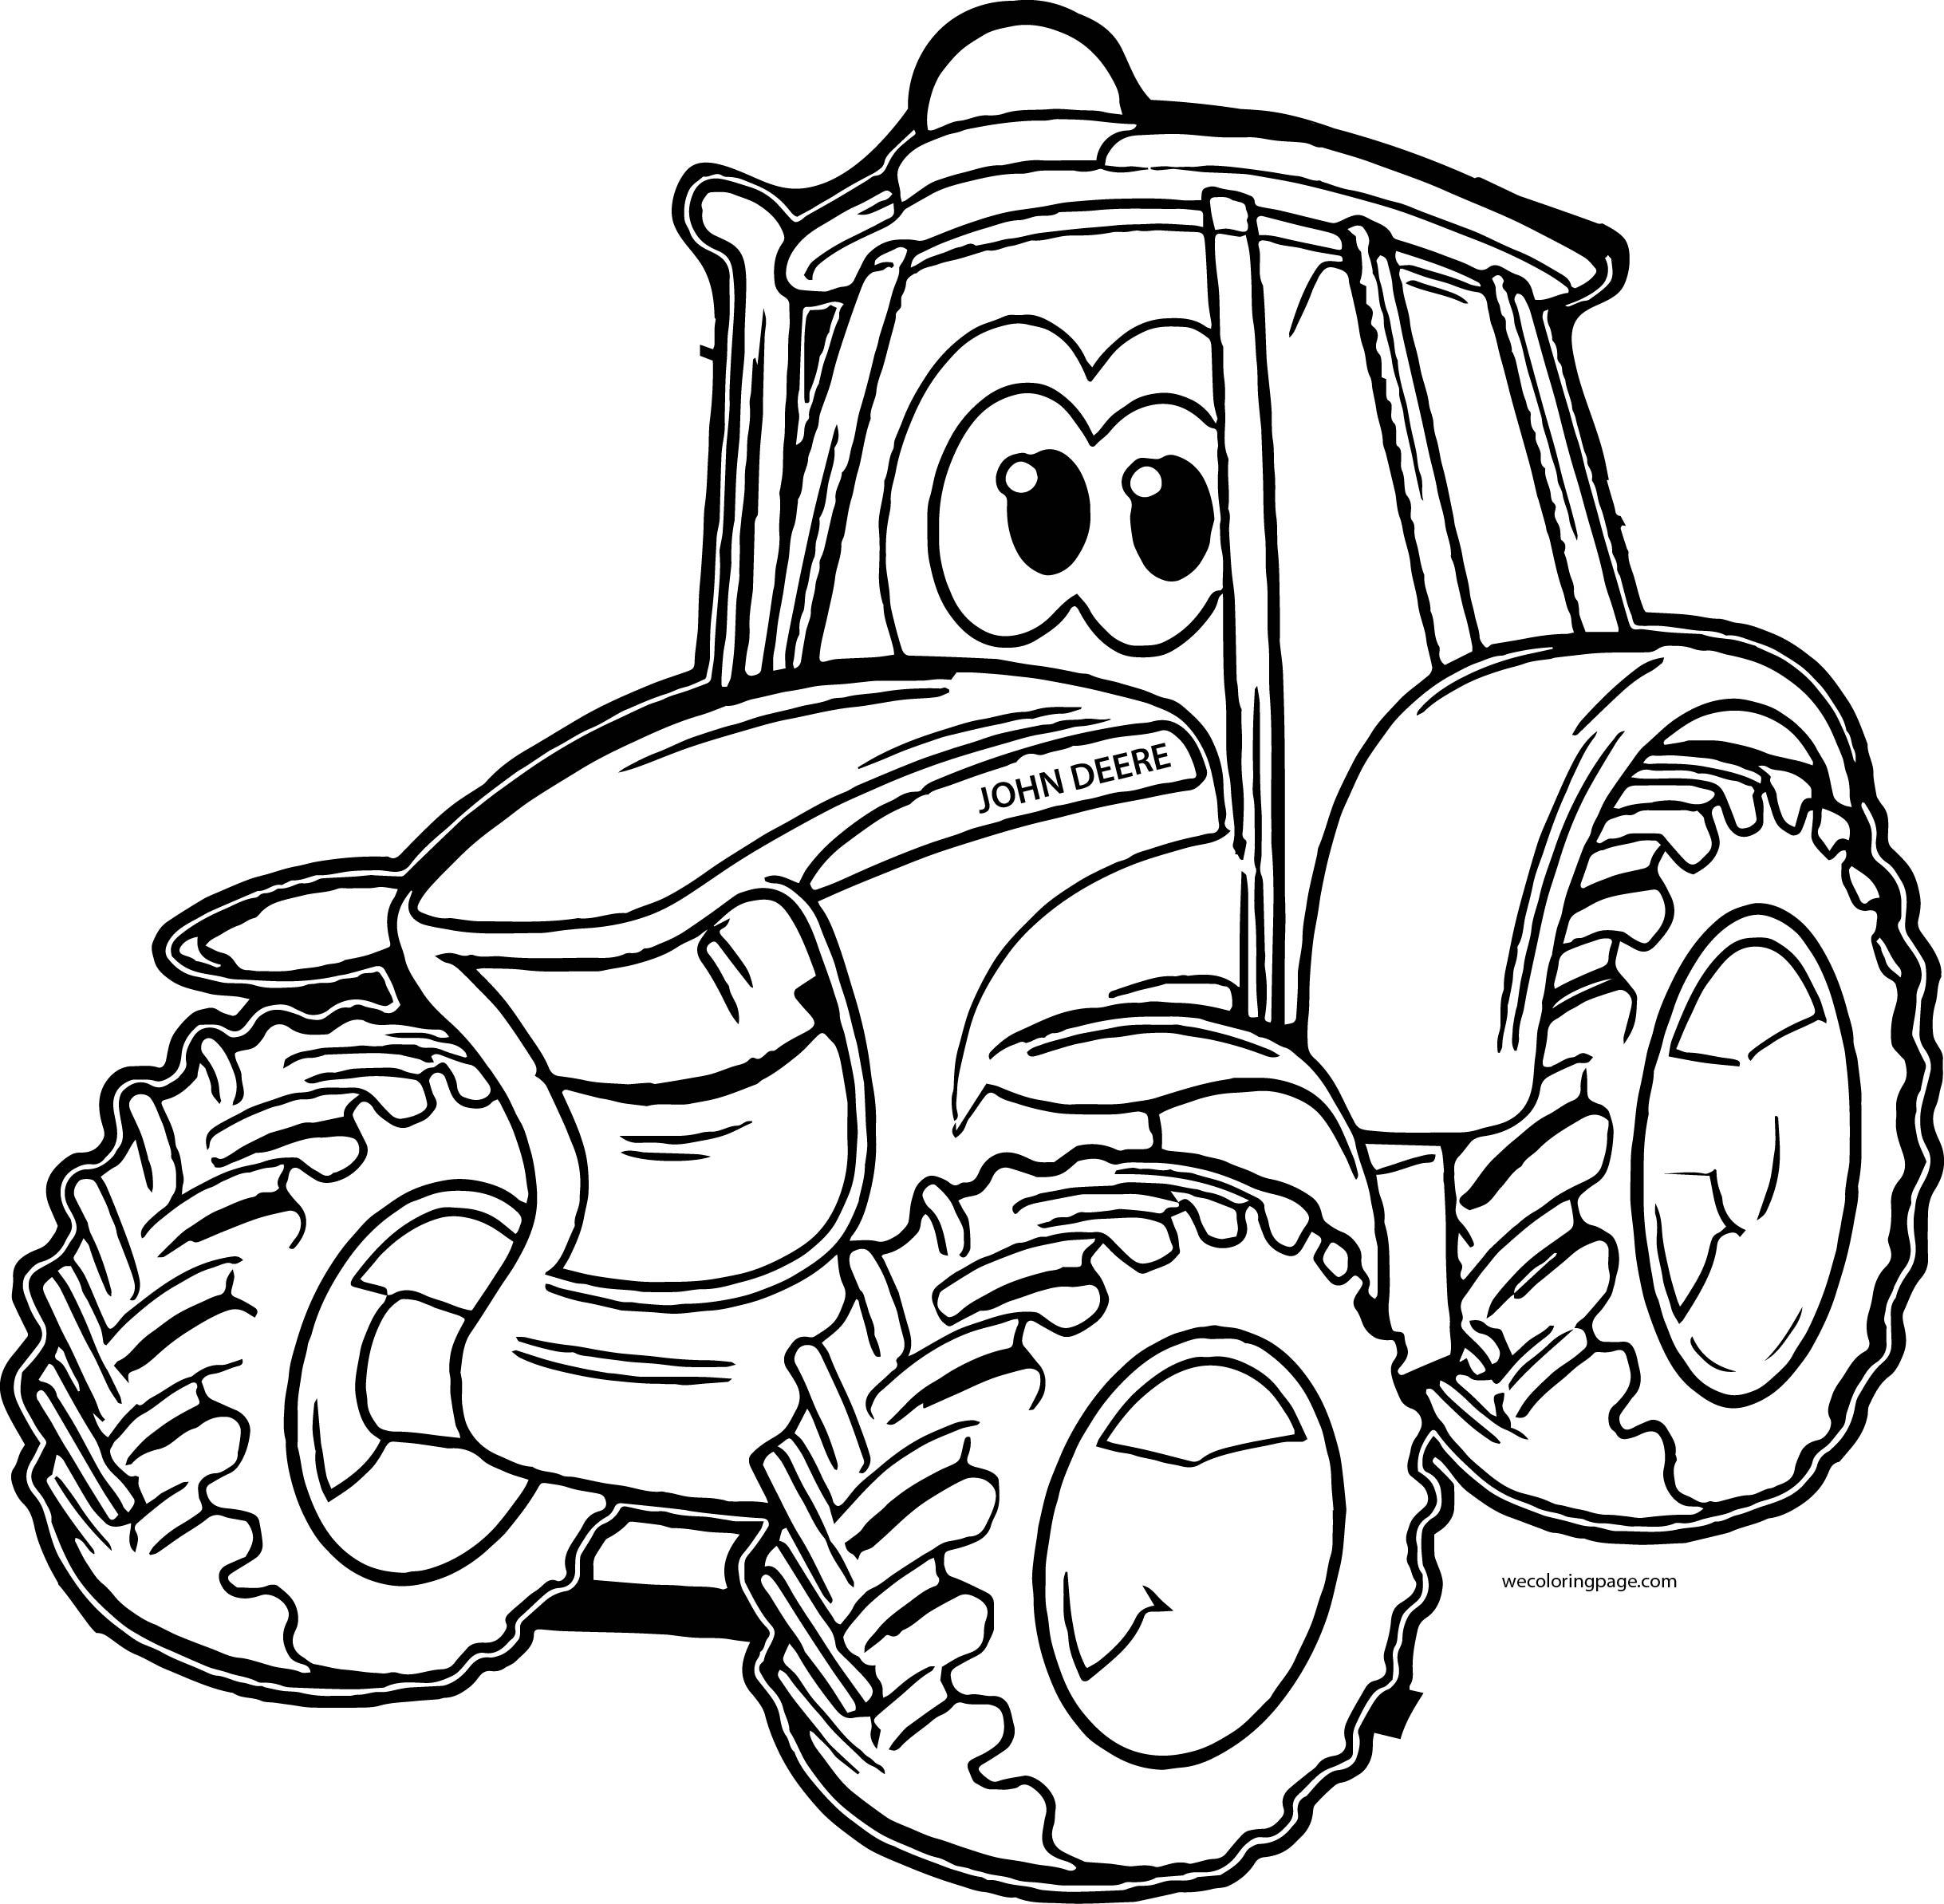 John Deere Tractor Drawing At Getdrawings